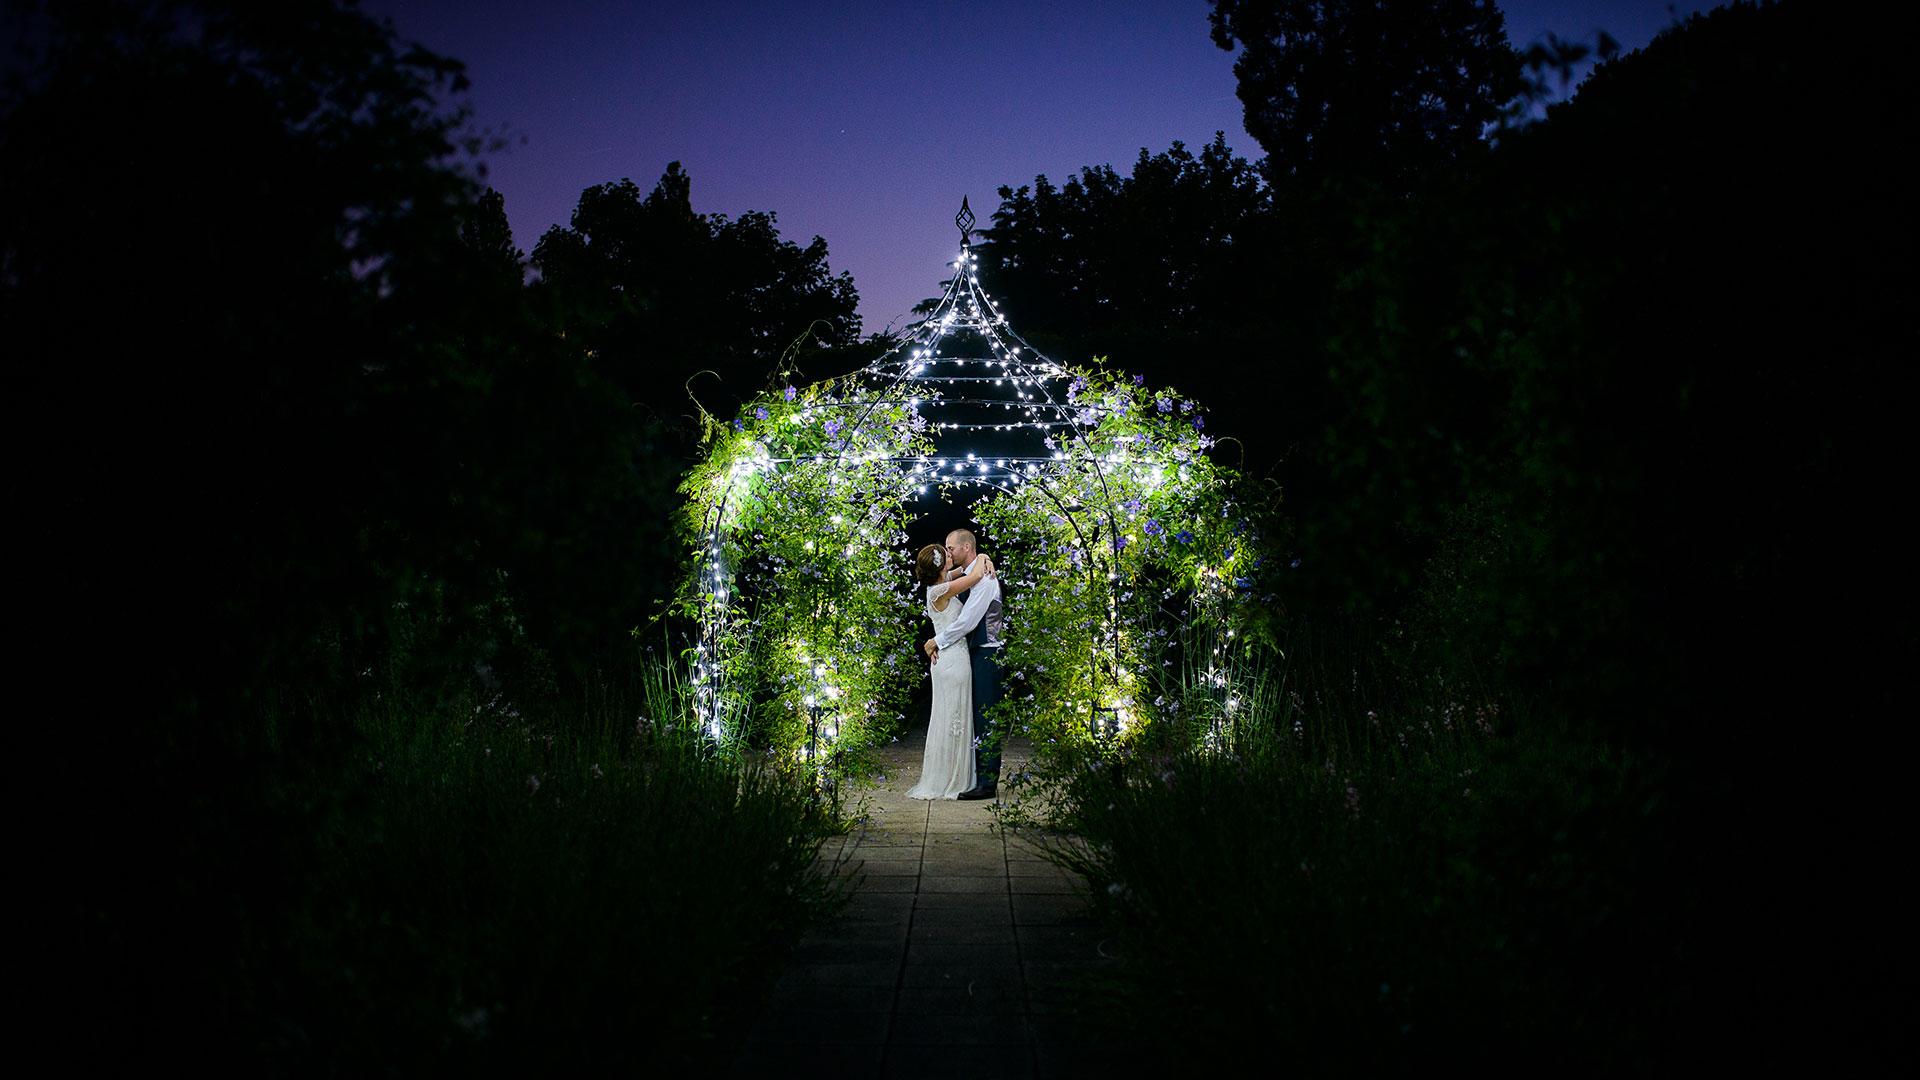 A bride and her bridesmaids make their way to the wedding reception through the romantic Walled Garden